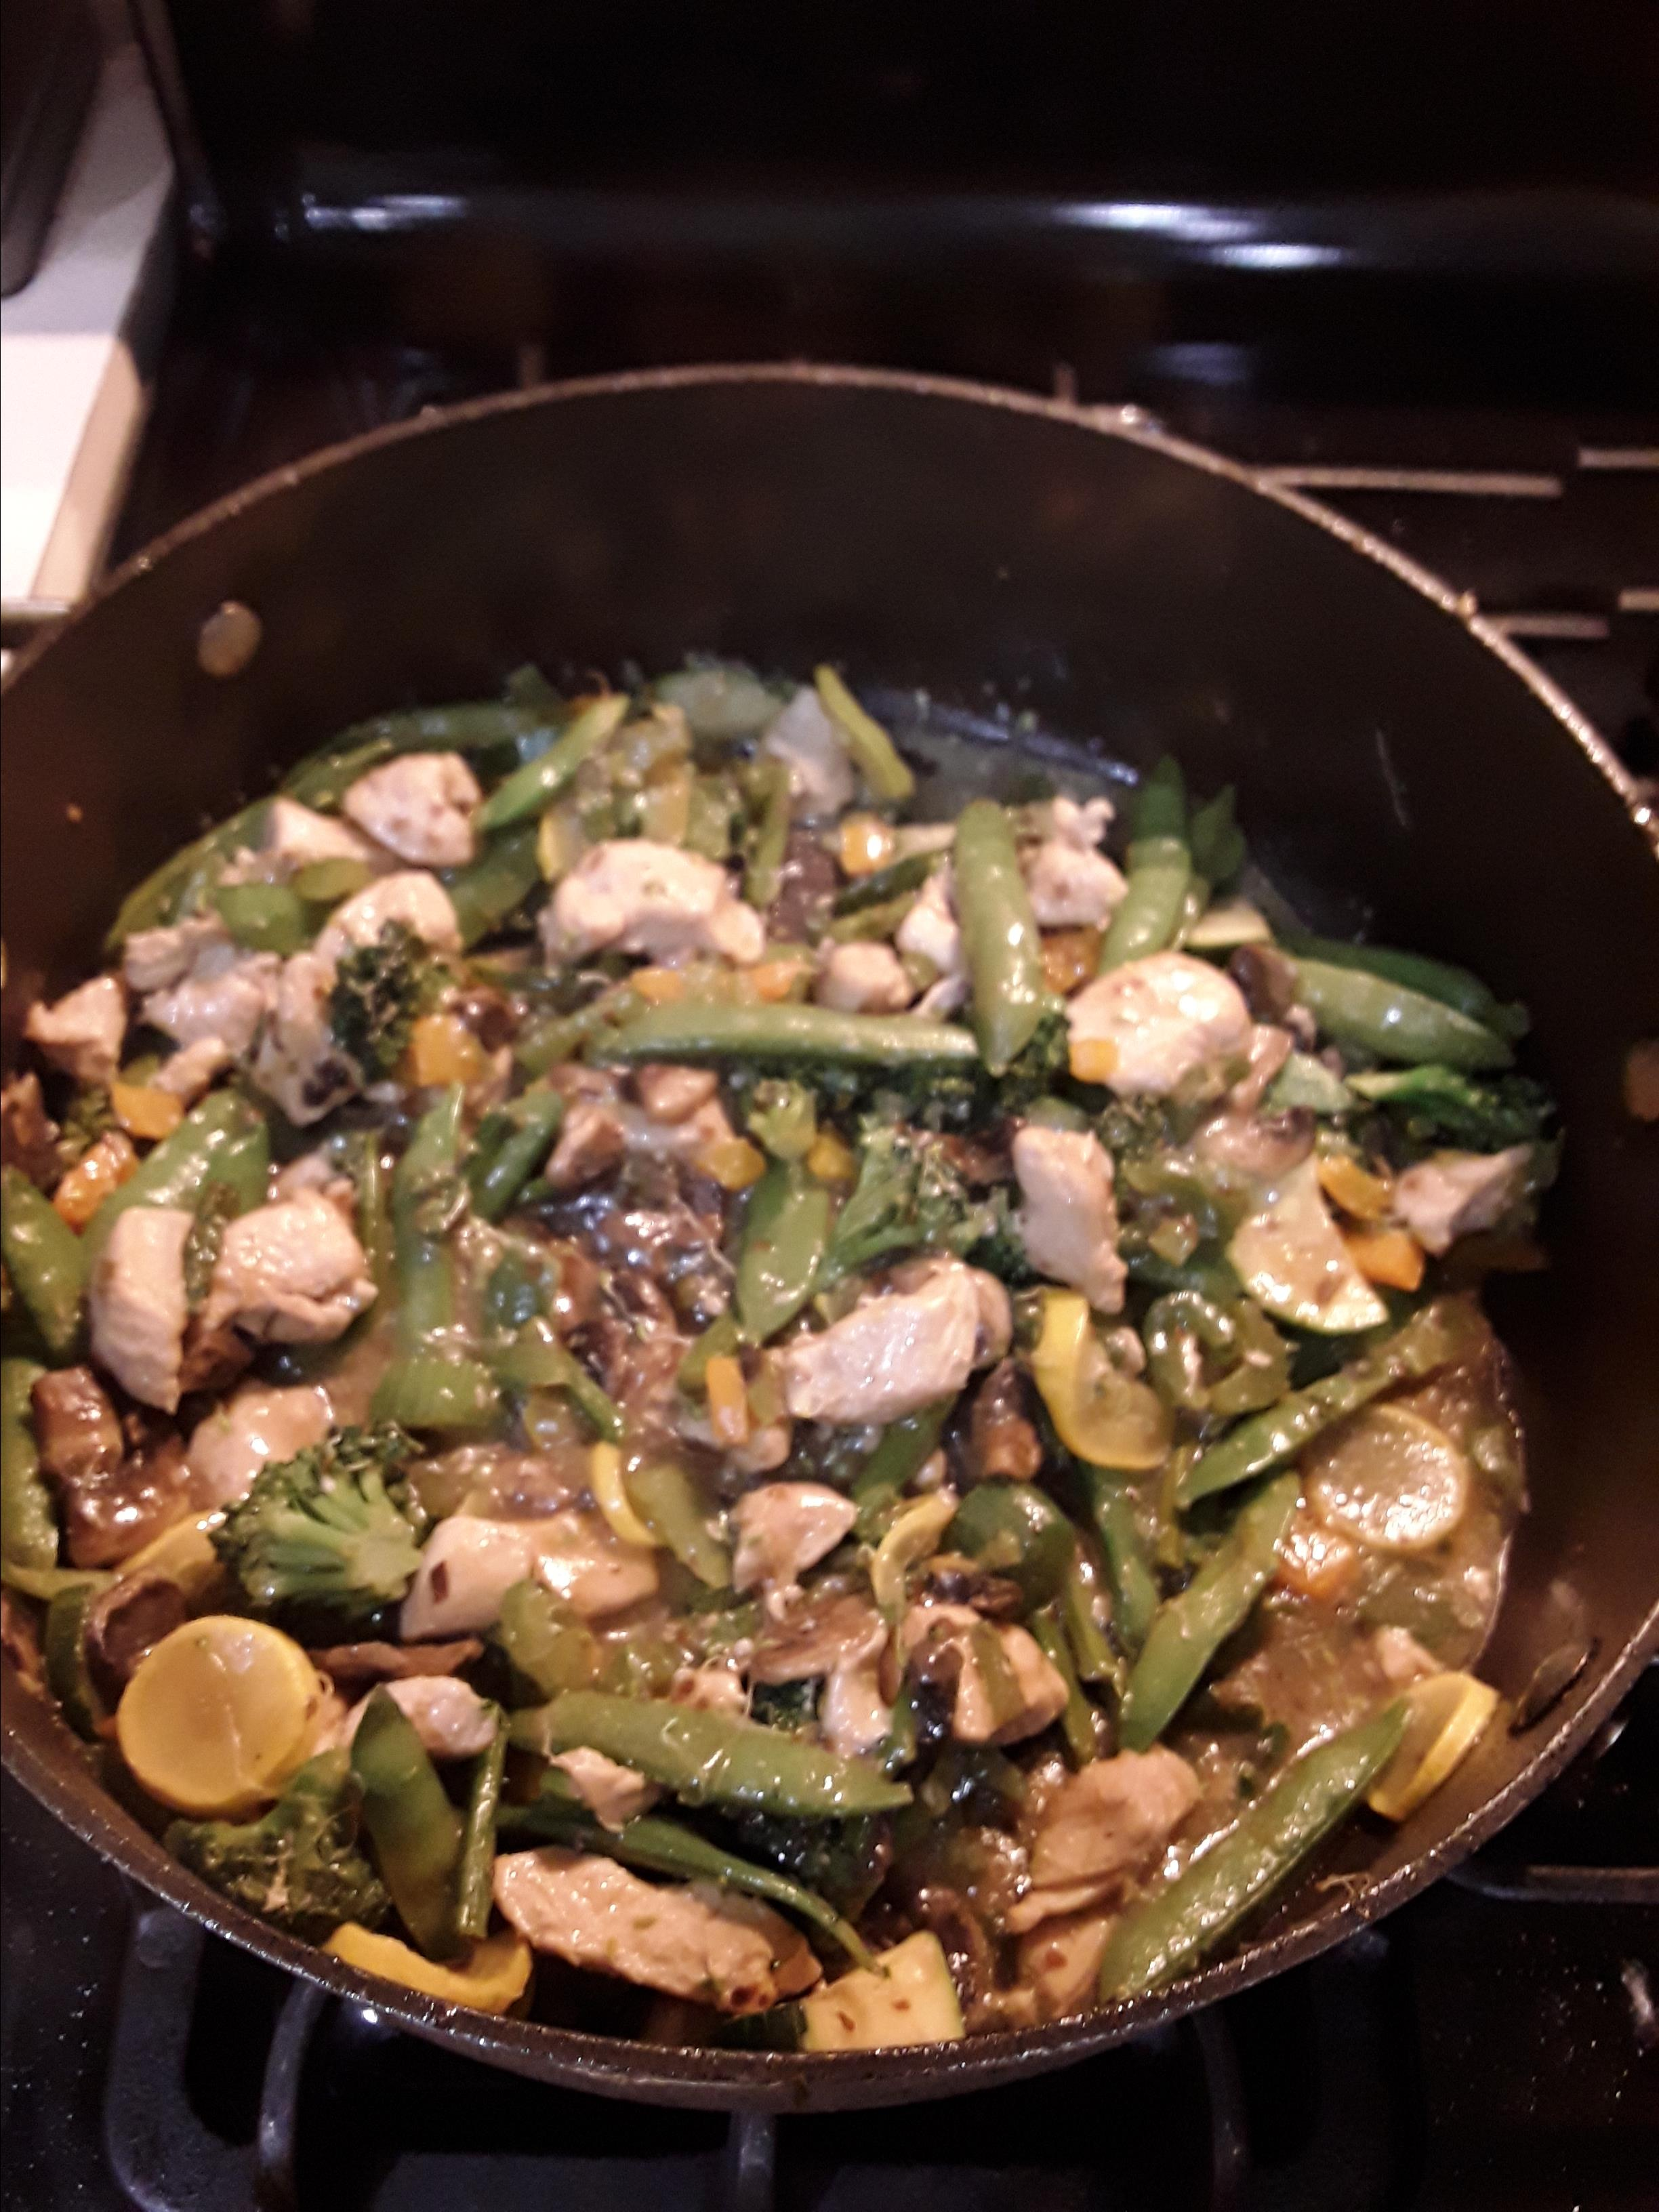 Stir-Fried Vegetables with Chicken or Pork Jodi Caldwell